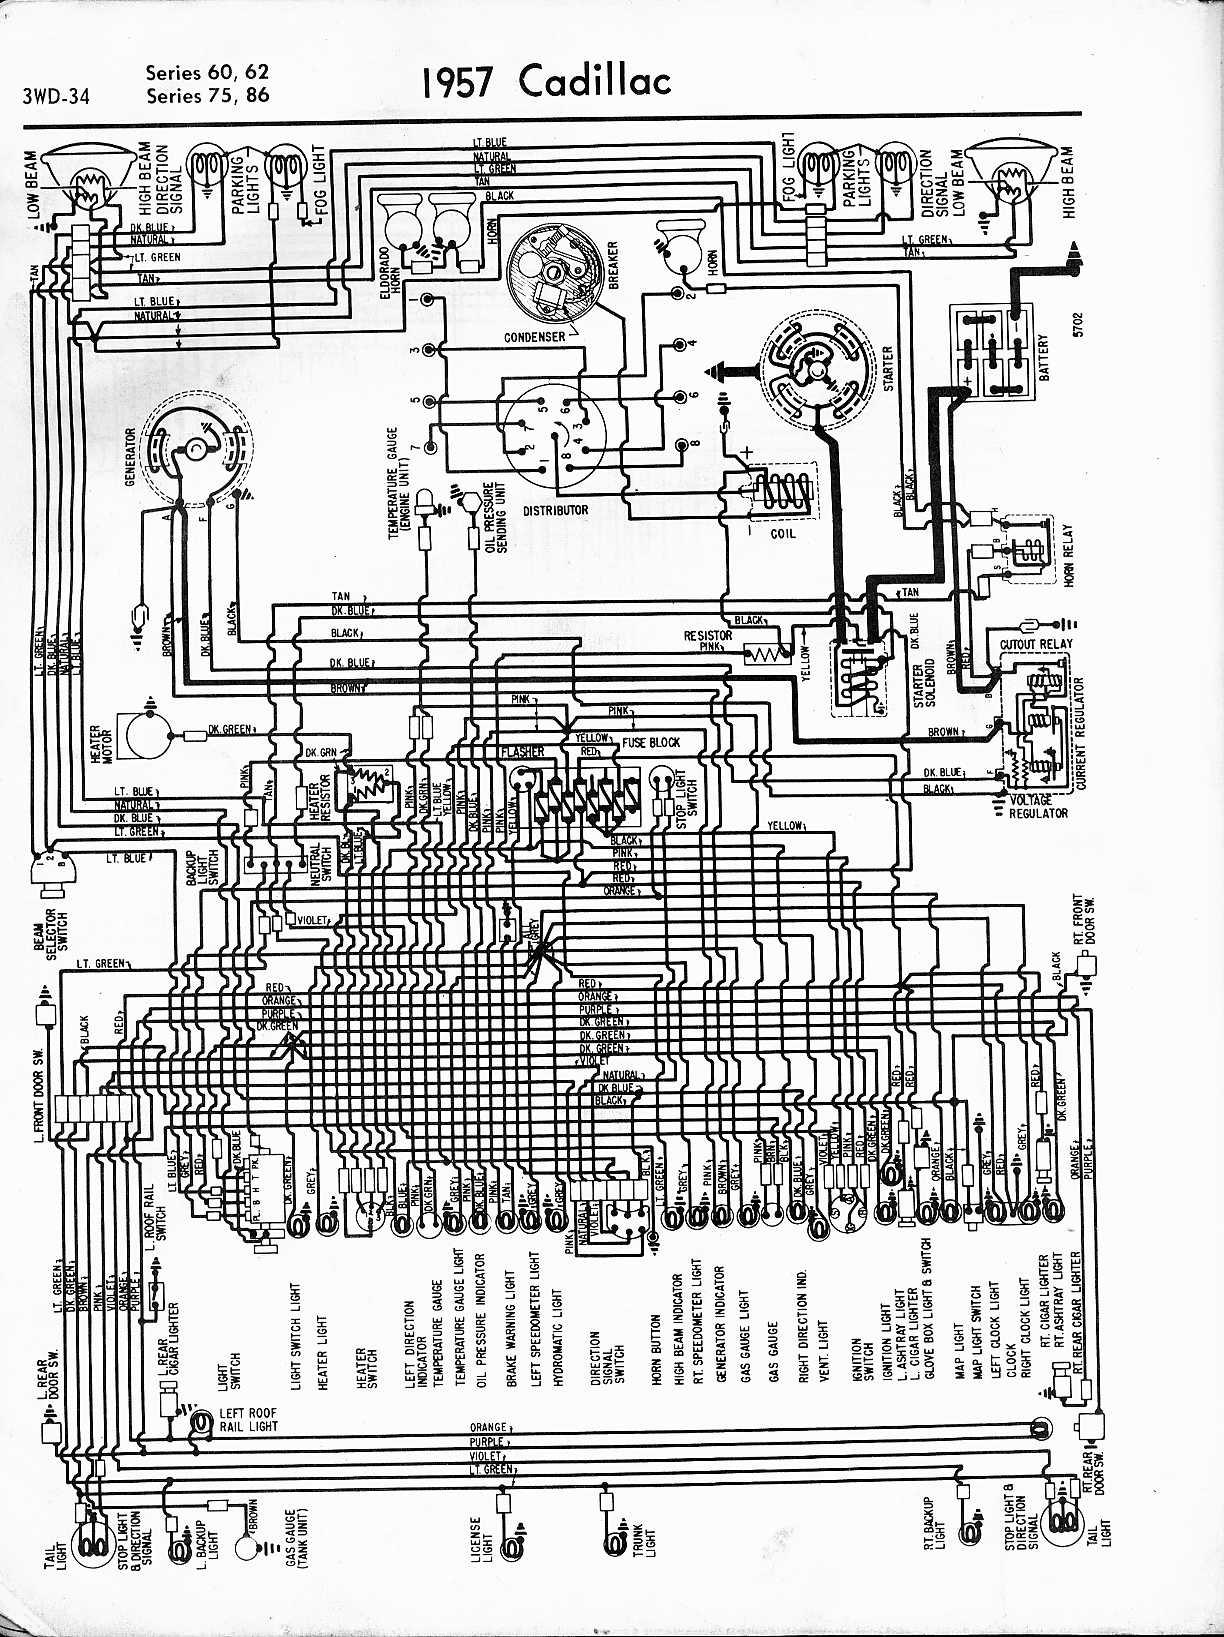 MWireCadi65_3WD 034?resize=665%2C889 surprising gmos 06 wiring diagram manual images wiring schematic gmos 06 wiring harness at virtualis.co